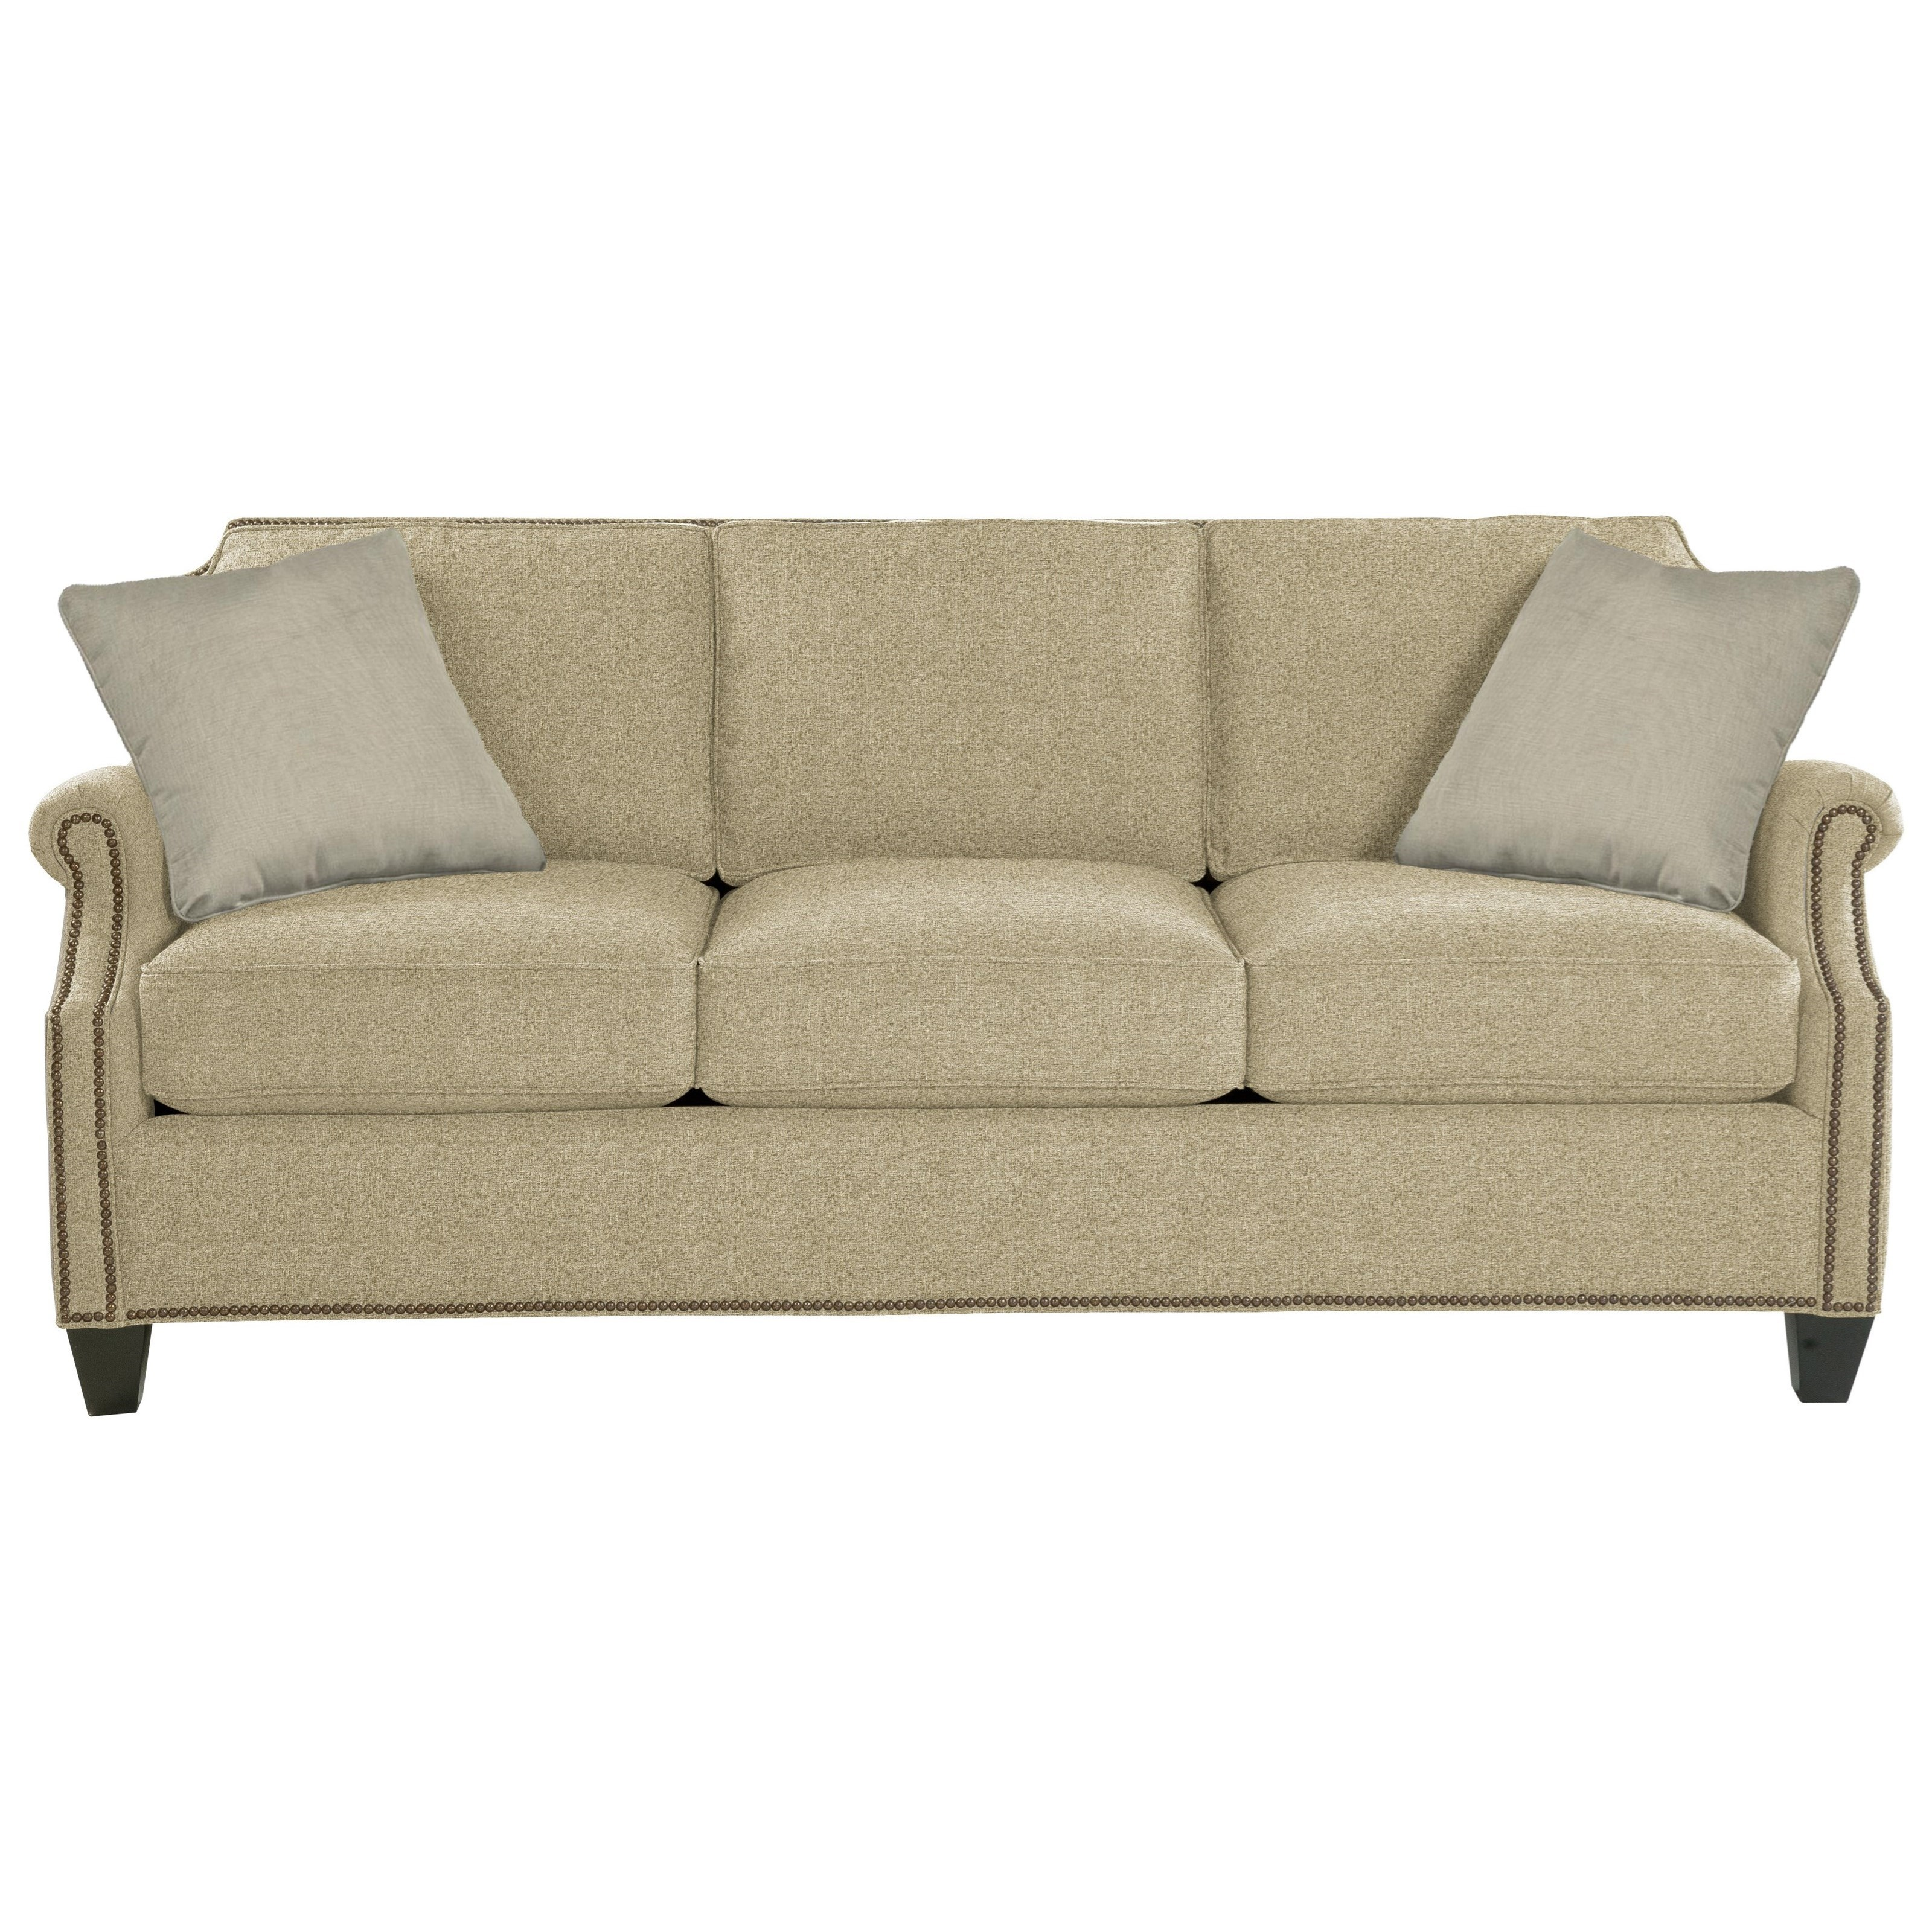 Craftmaster 9383 Sofa - Item Number: 938350-NEWBURY-10